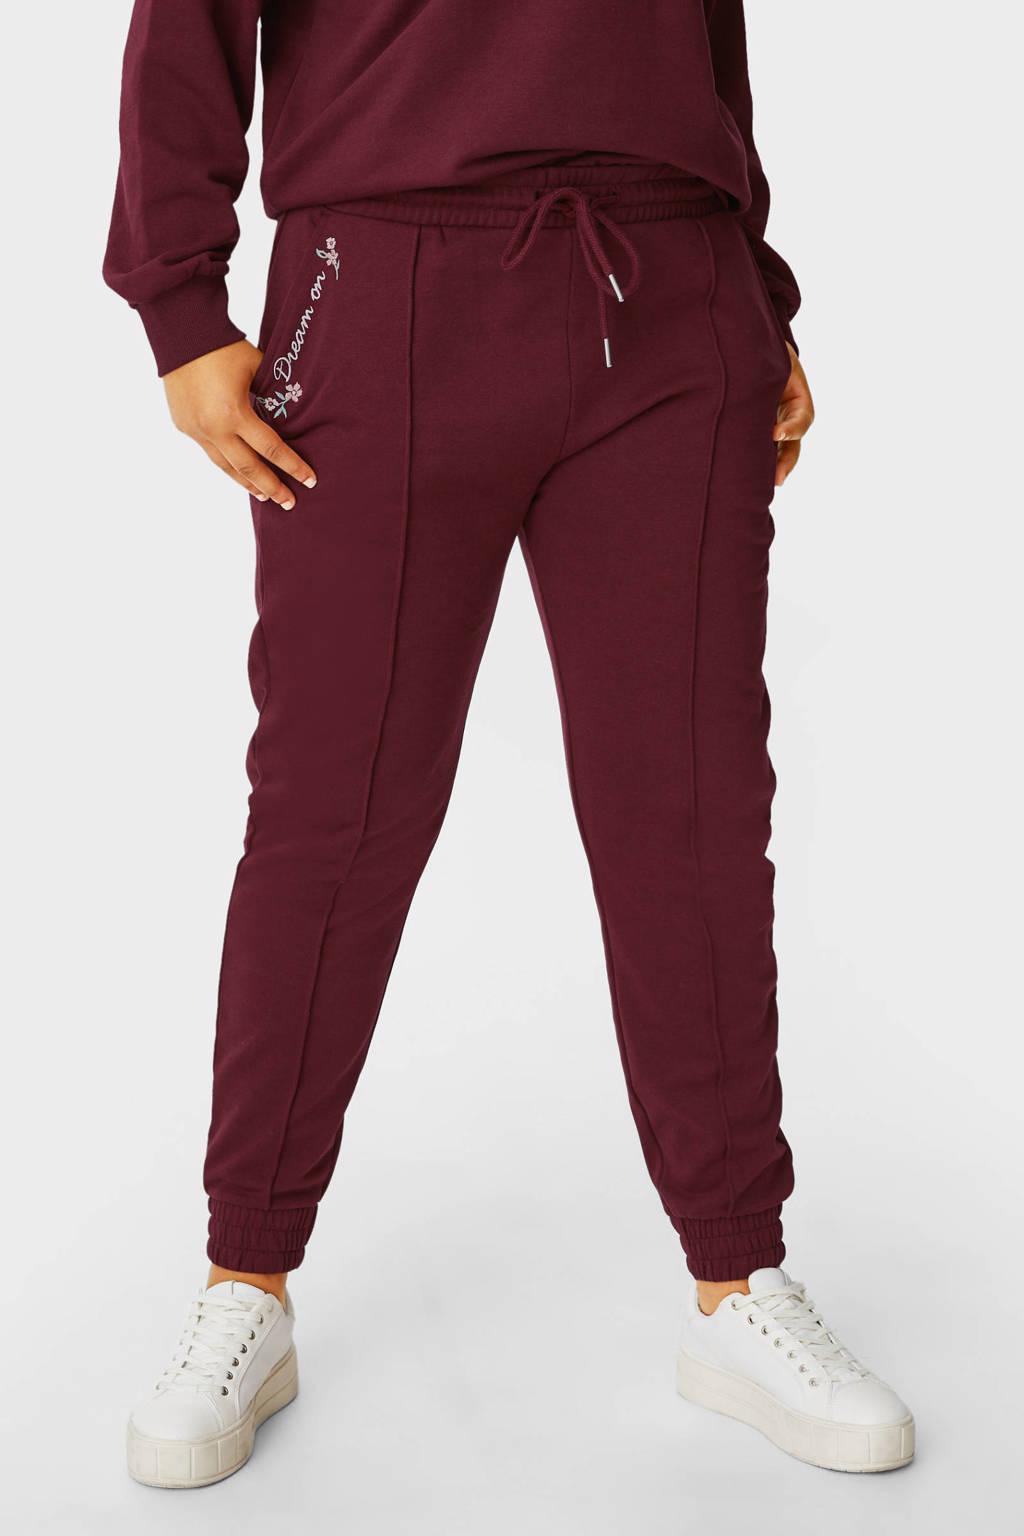 C&A Clockhouse regular fit broek met borduursels donkerrood/wit/zachtroze, Donkerrood/wit/zachtroze